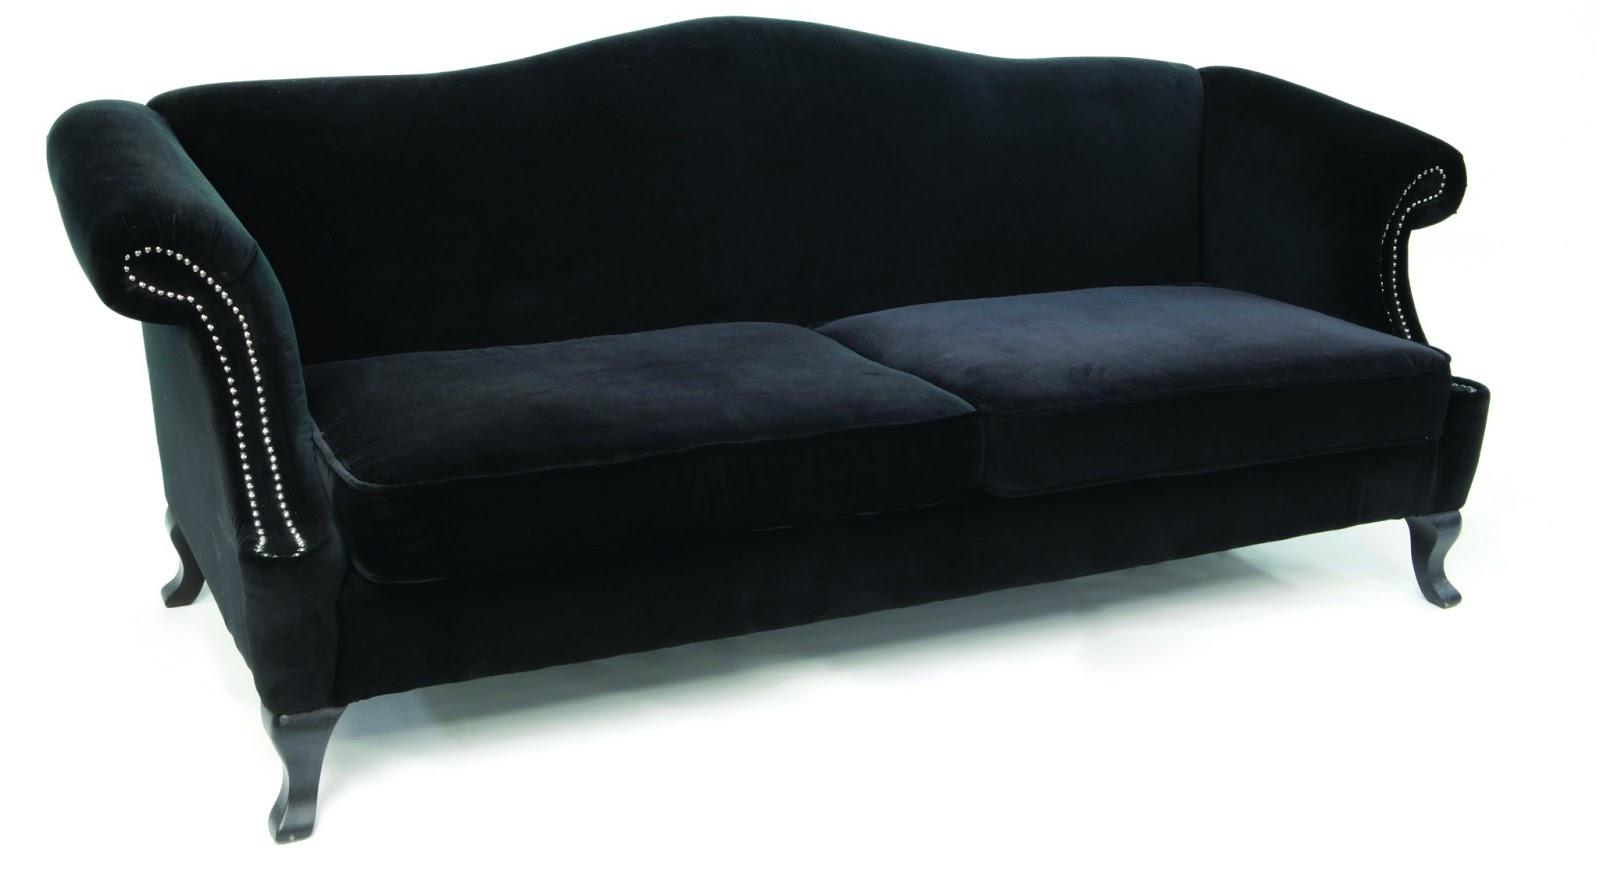 Alvorlig U Sofa Brugt | Flot Sovesofa Med Chaiselong I Top Kvalitet OE29